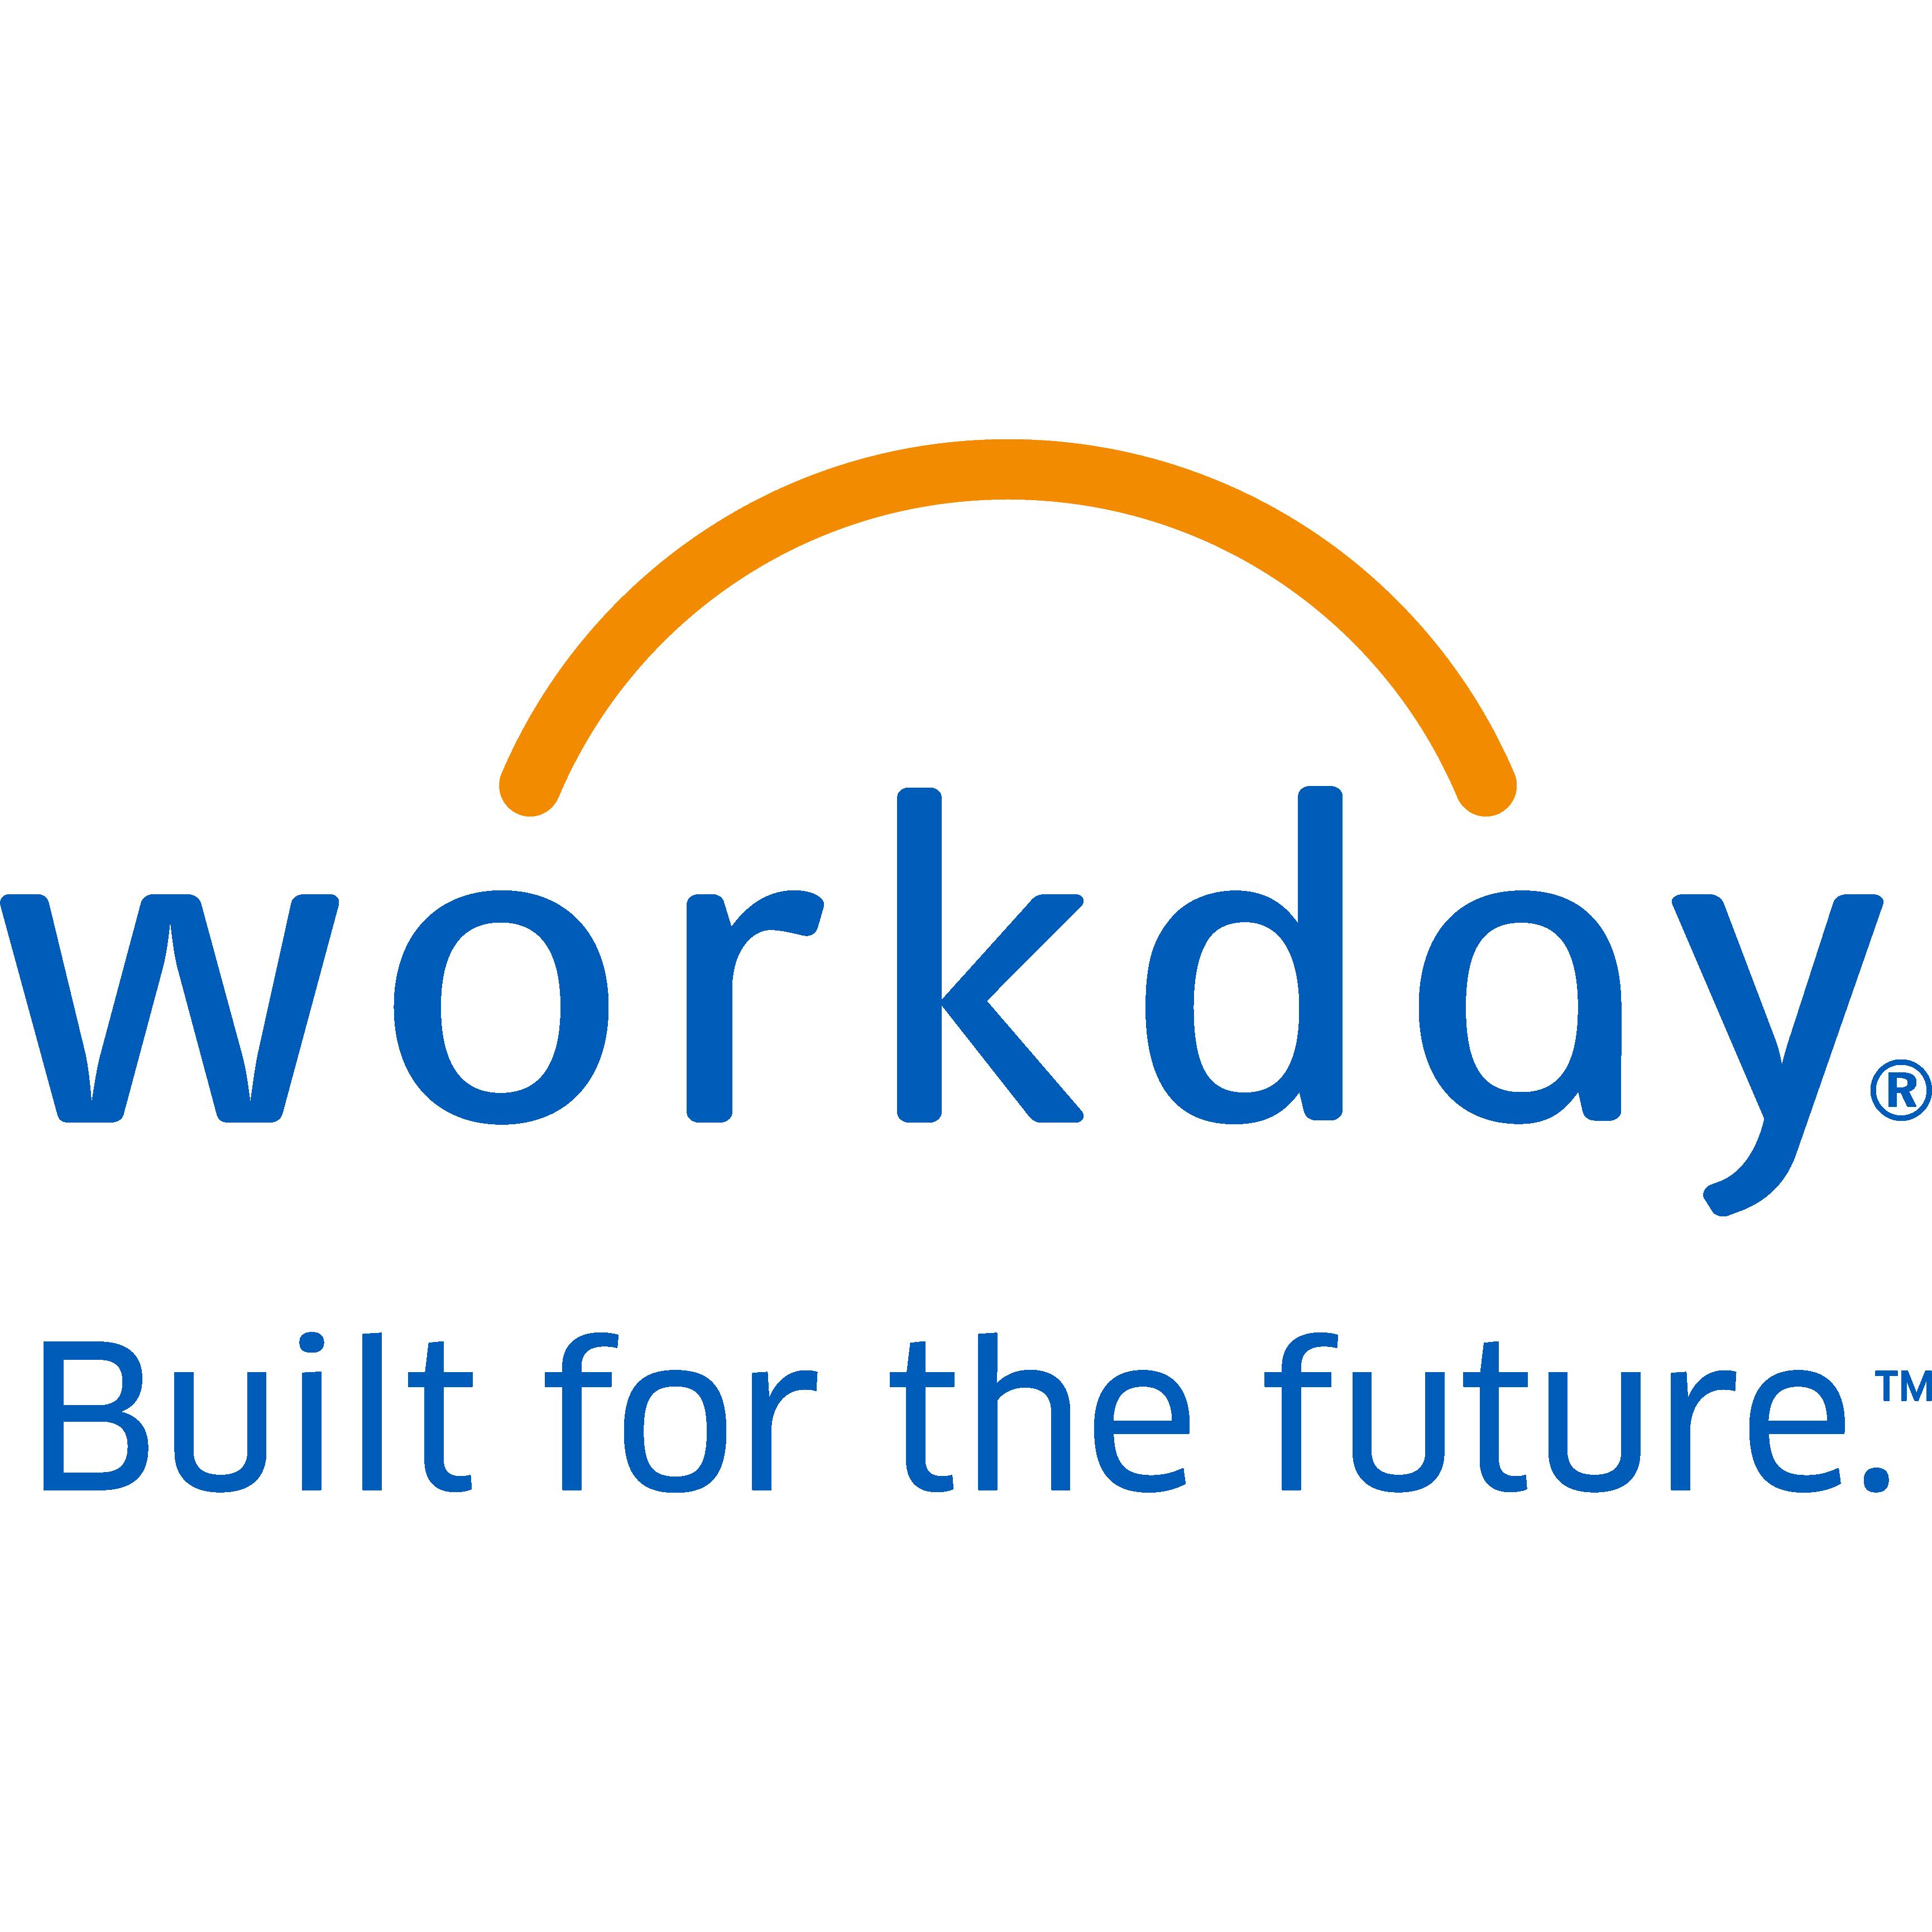 ed323e84fc0ee9 GL-SponsorLogo-Workday » Media